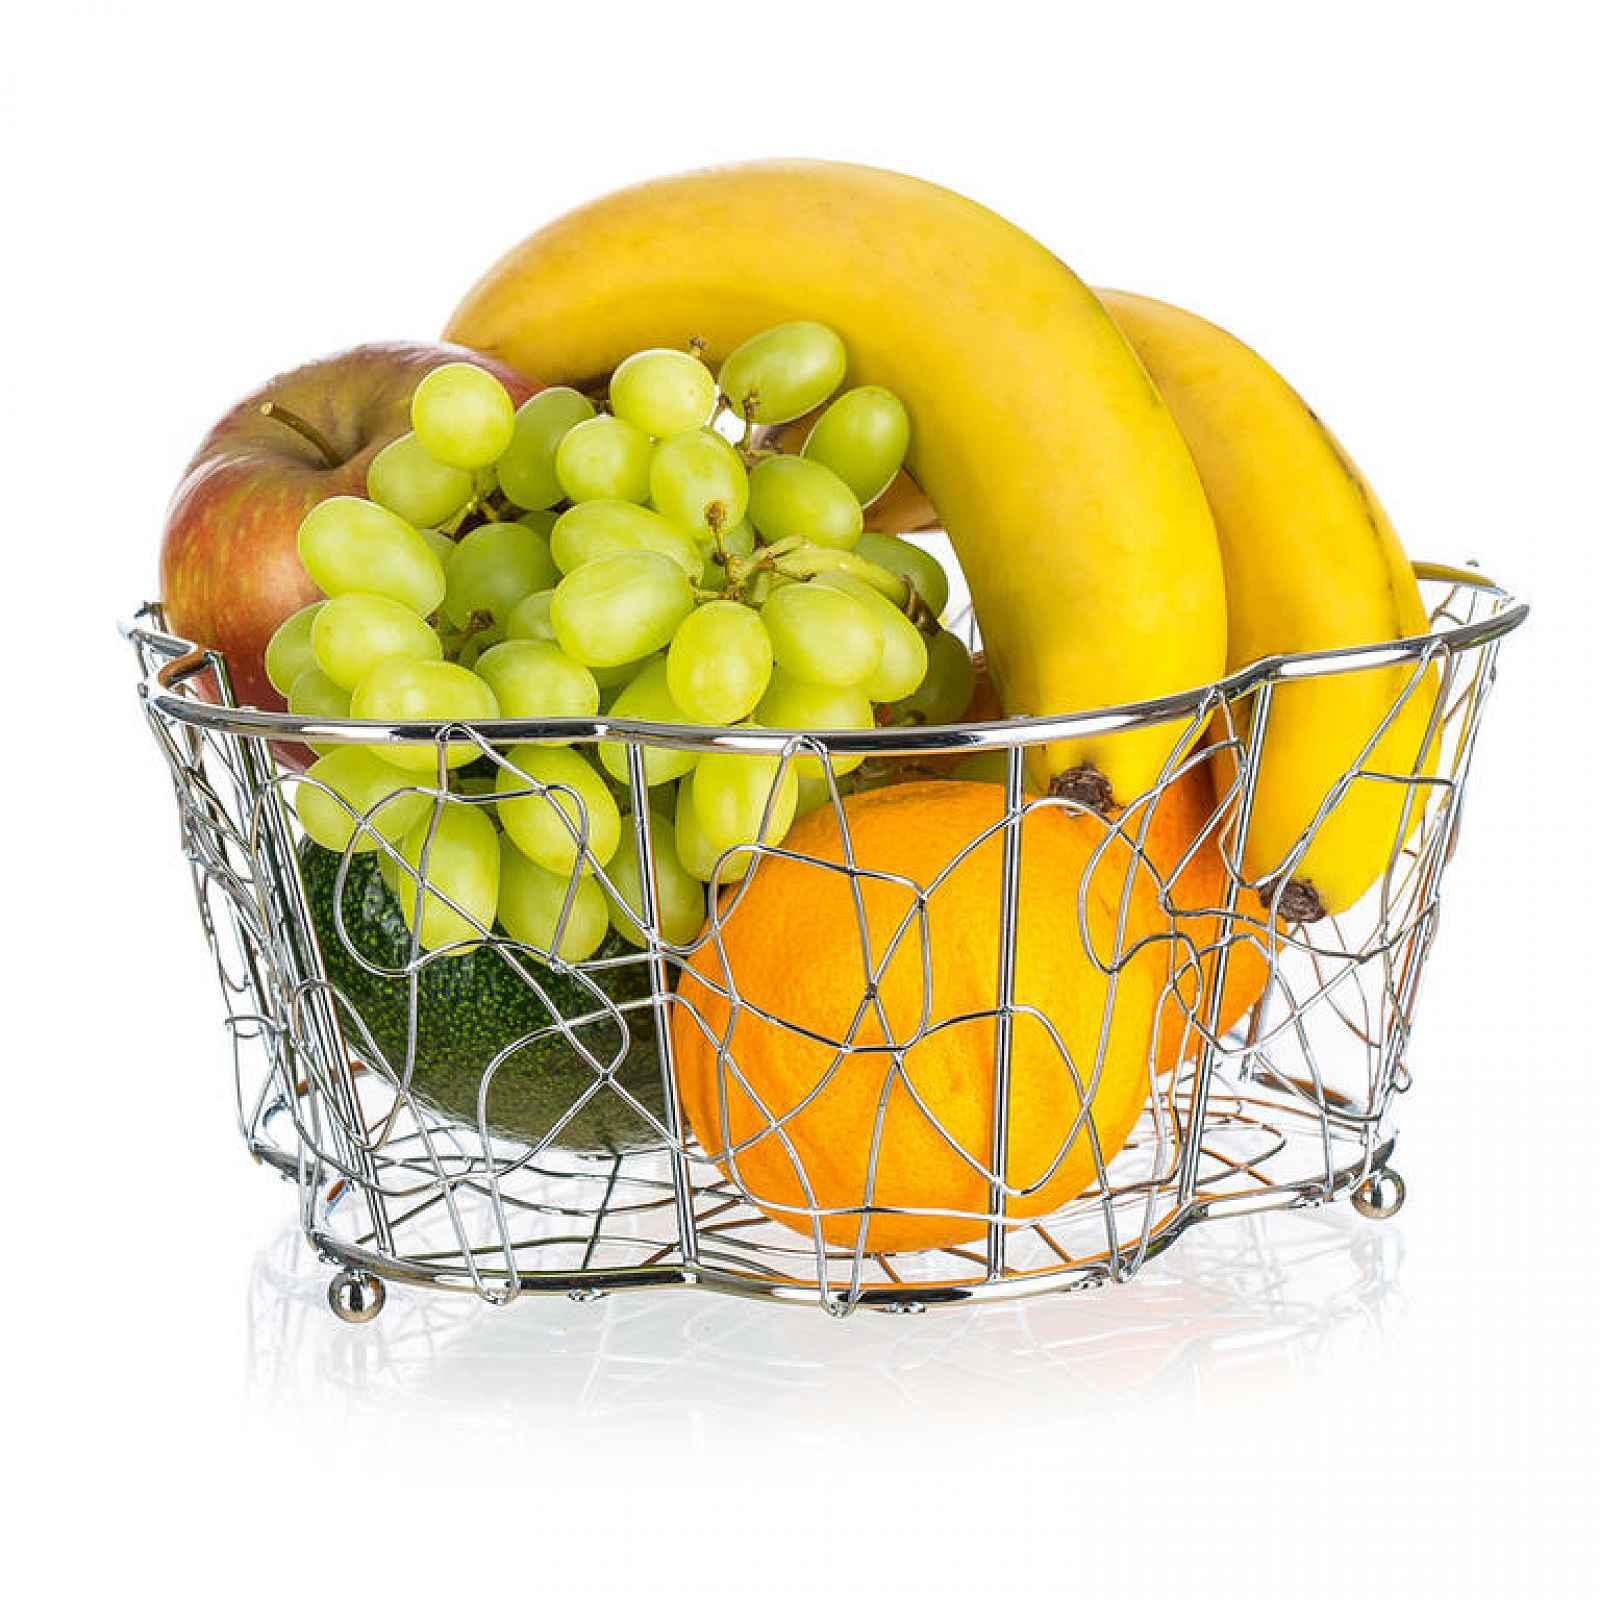 Banquet Koš na ovoce VANITY 24x10cm